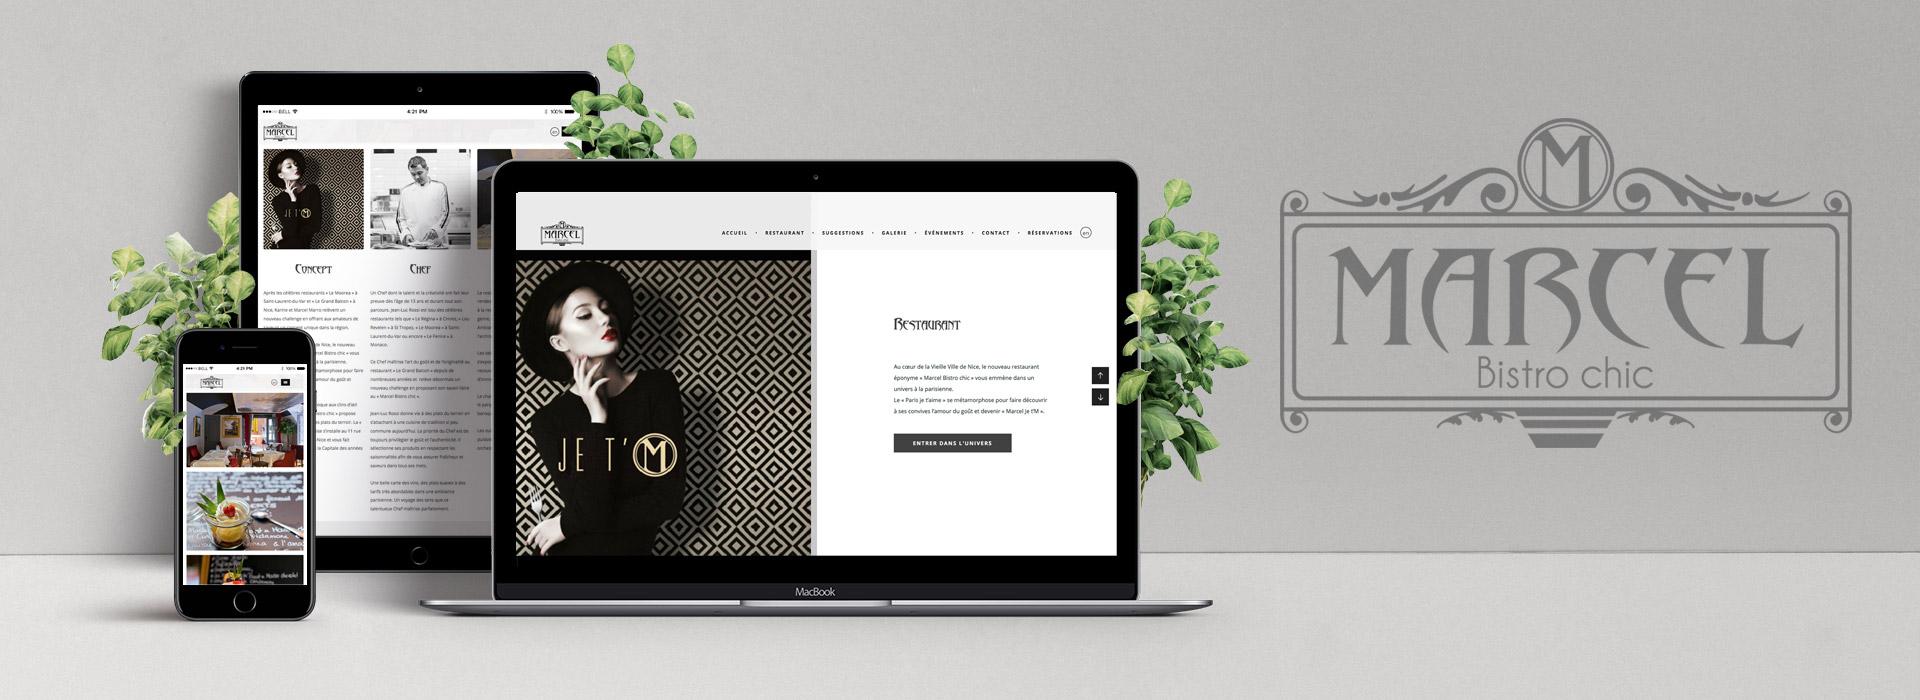 http://agence-communication-site-internet-marcel-paysage-web